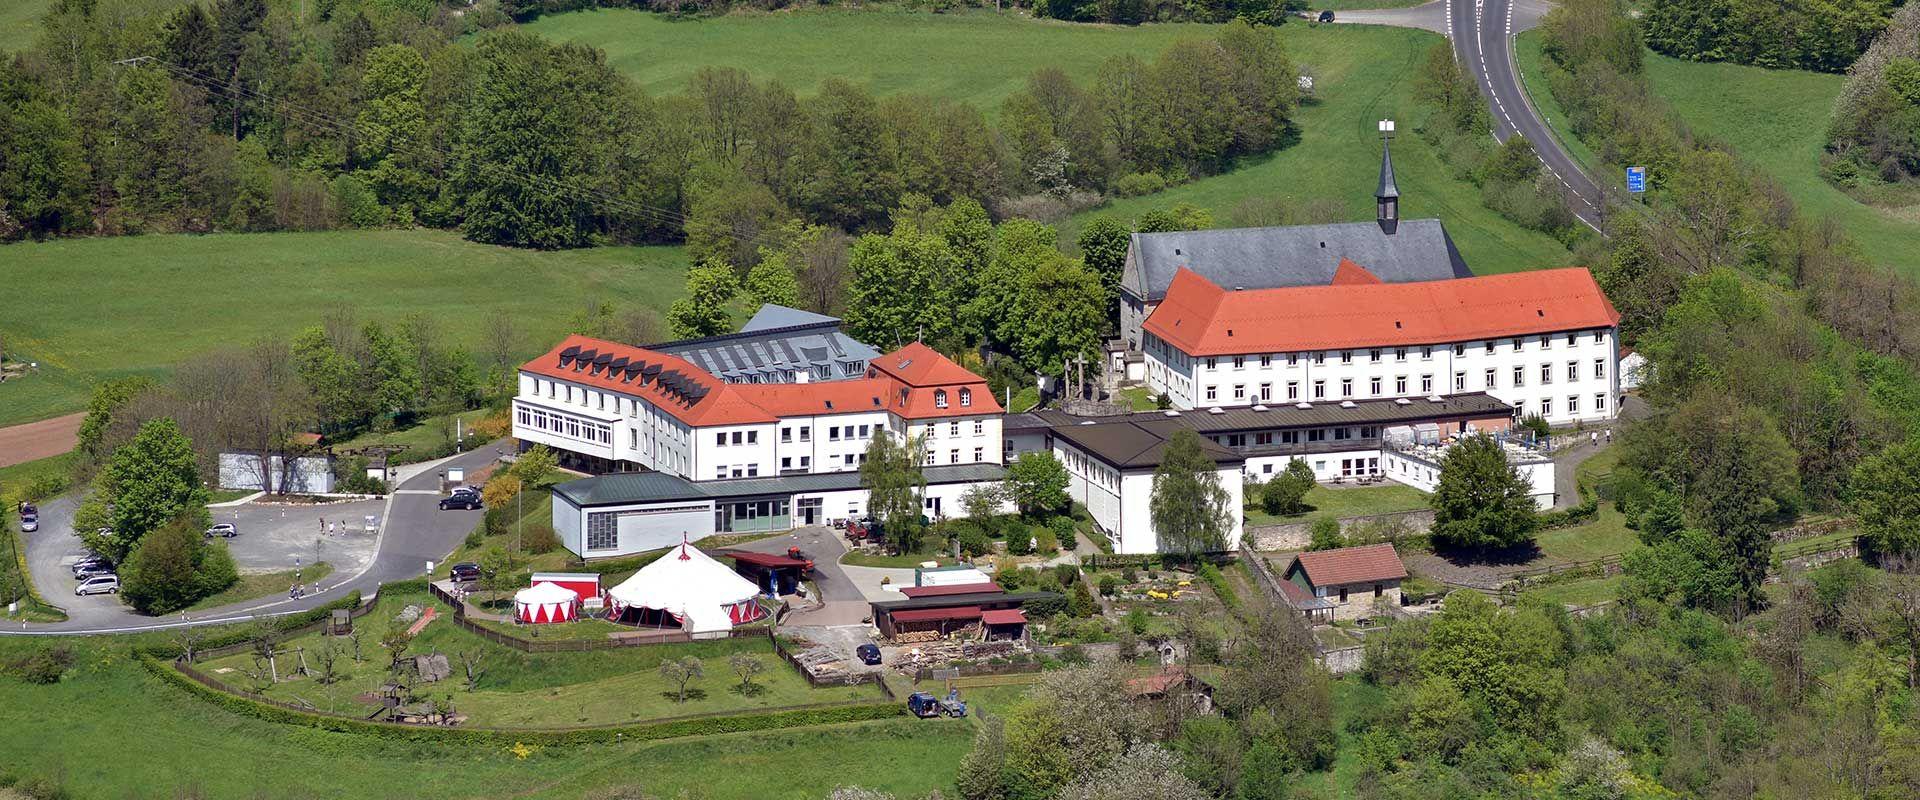 Volkersberg